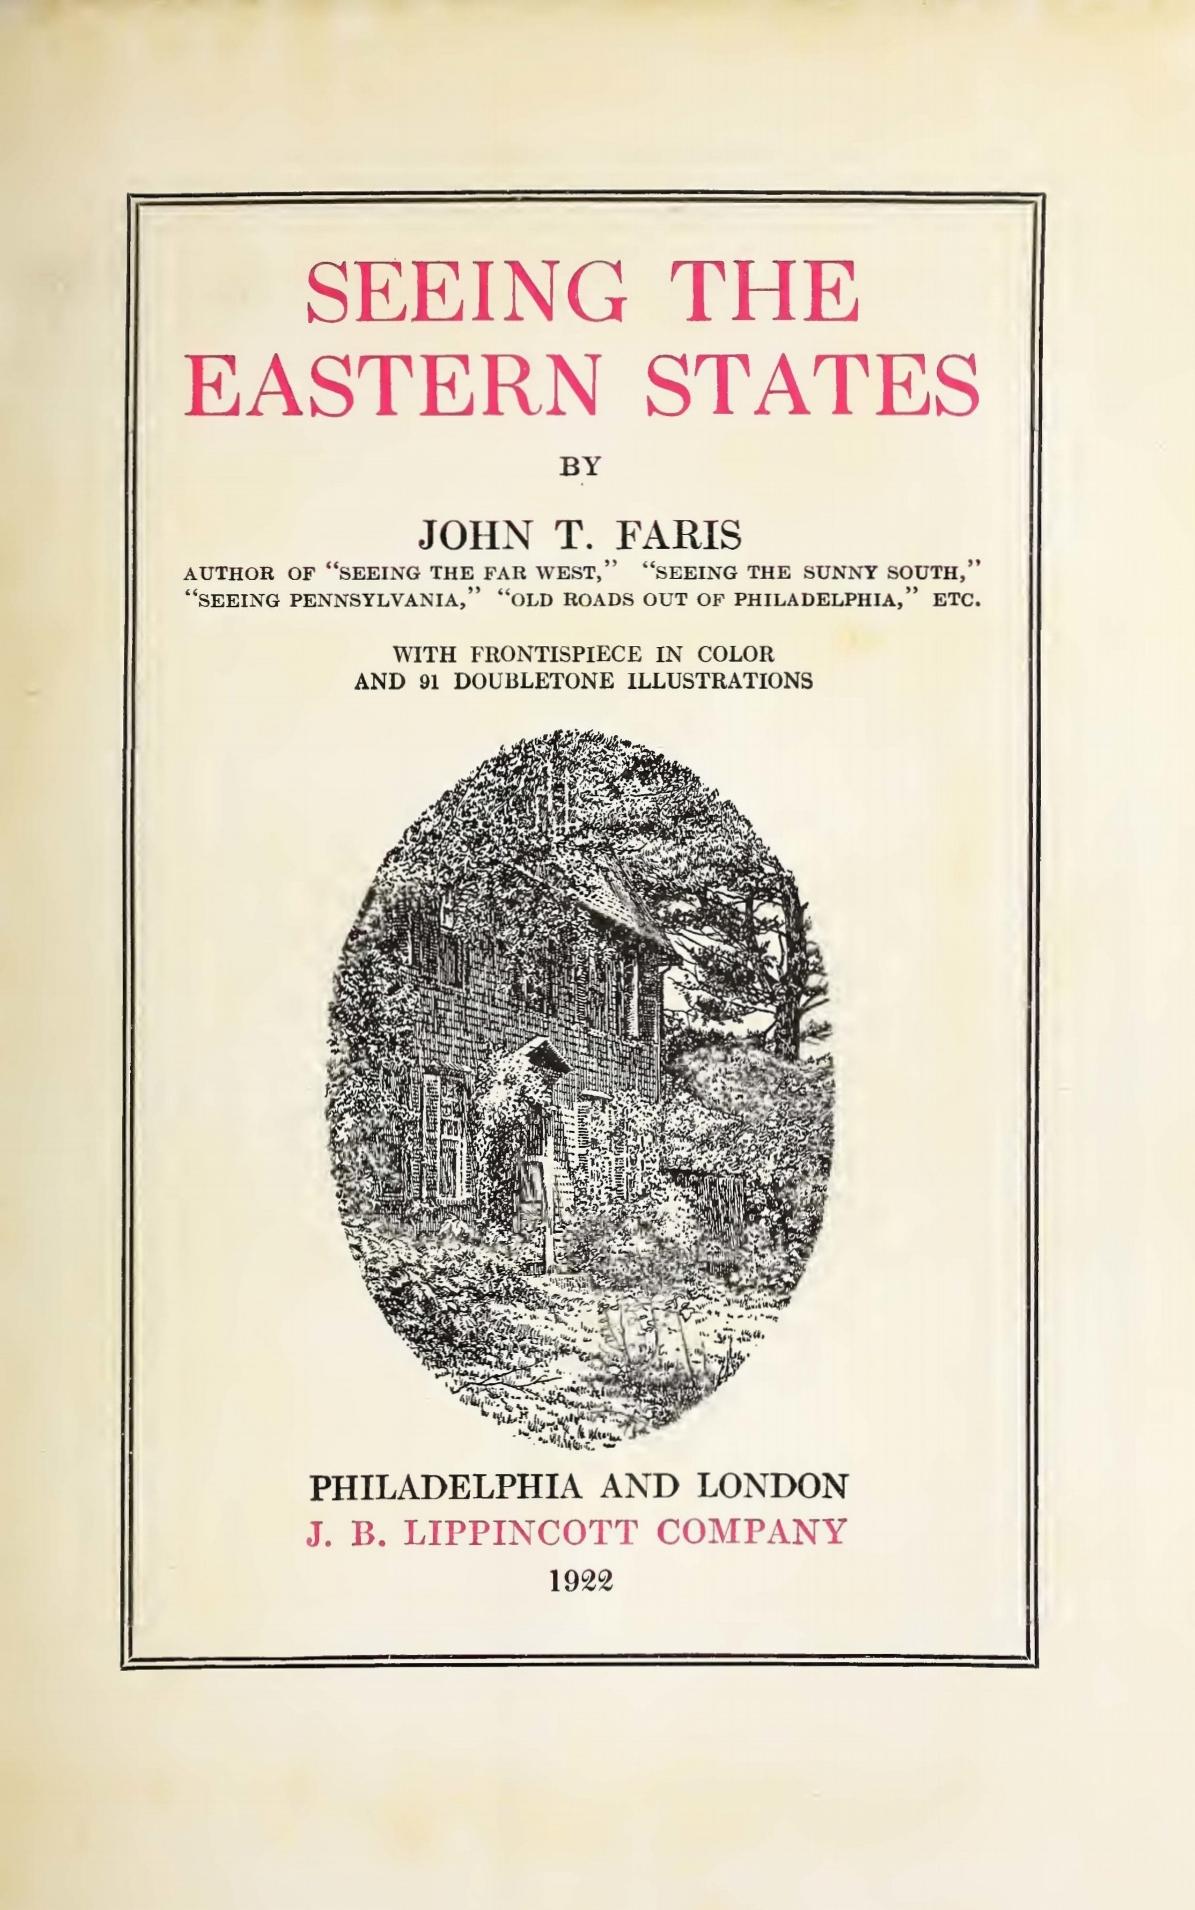 Faris, John Thomson, Seeing the Eastern States Title Page.jpg